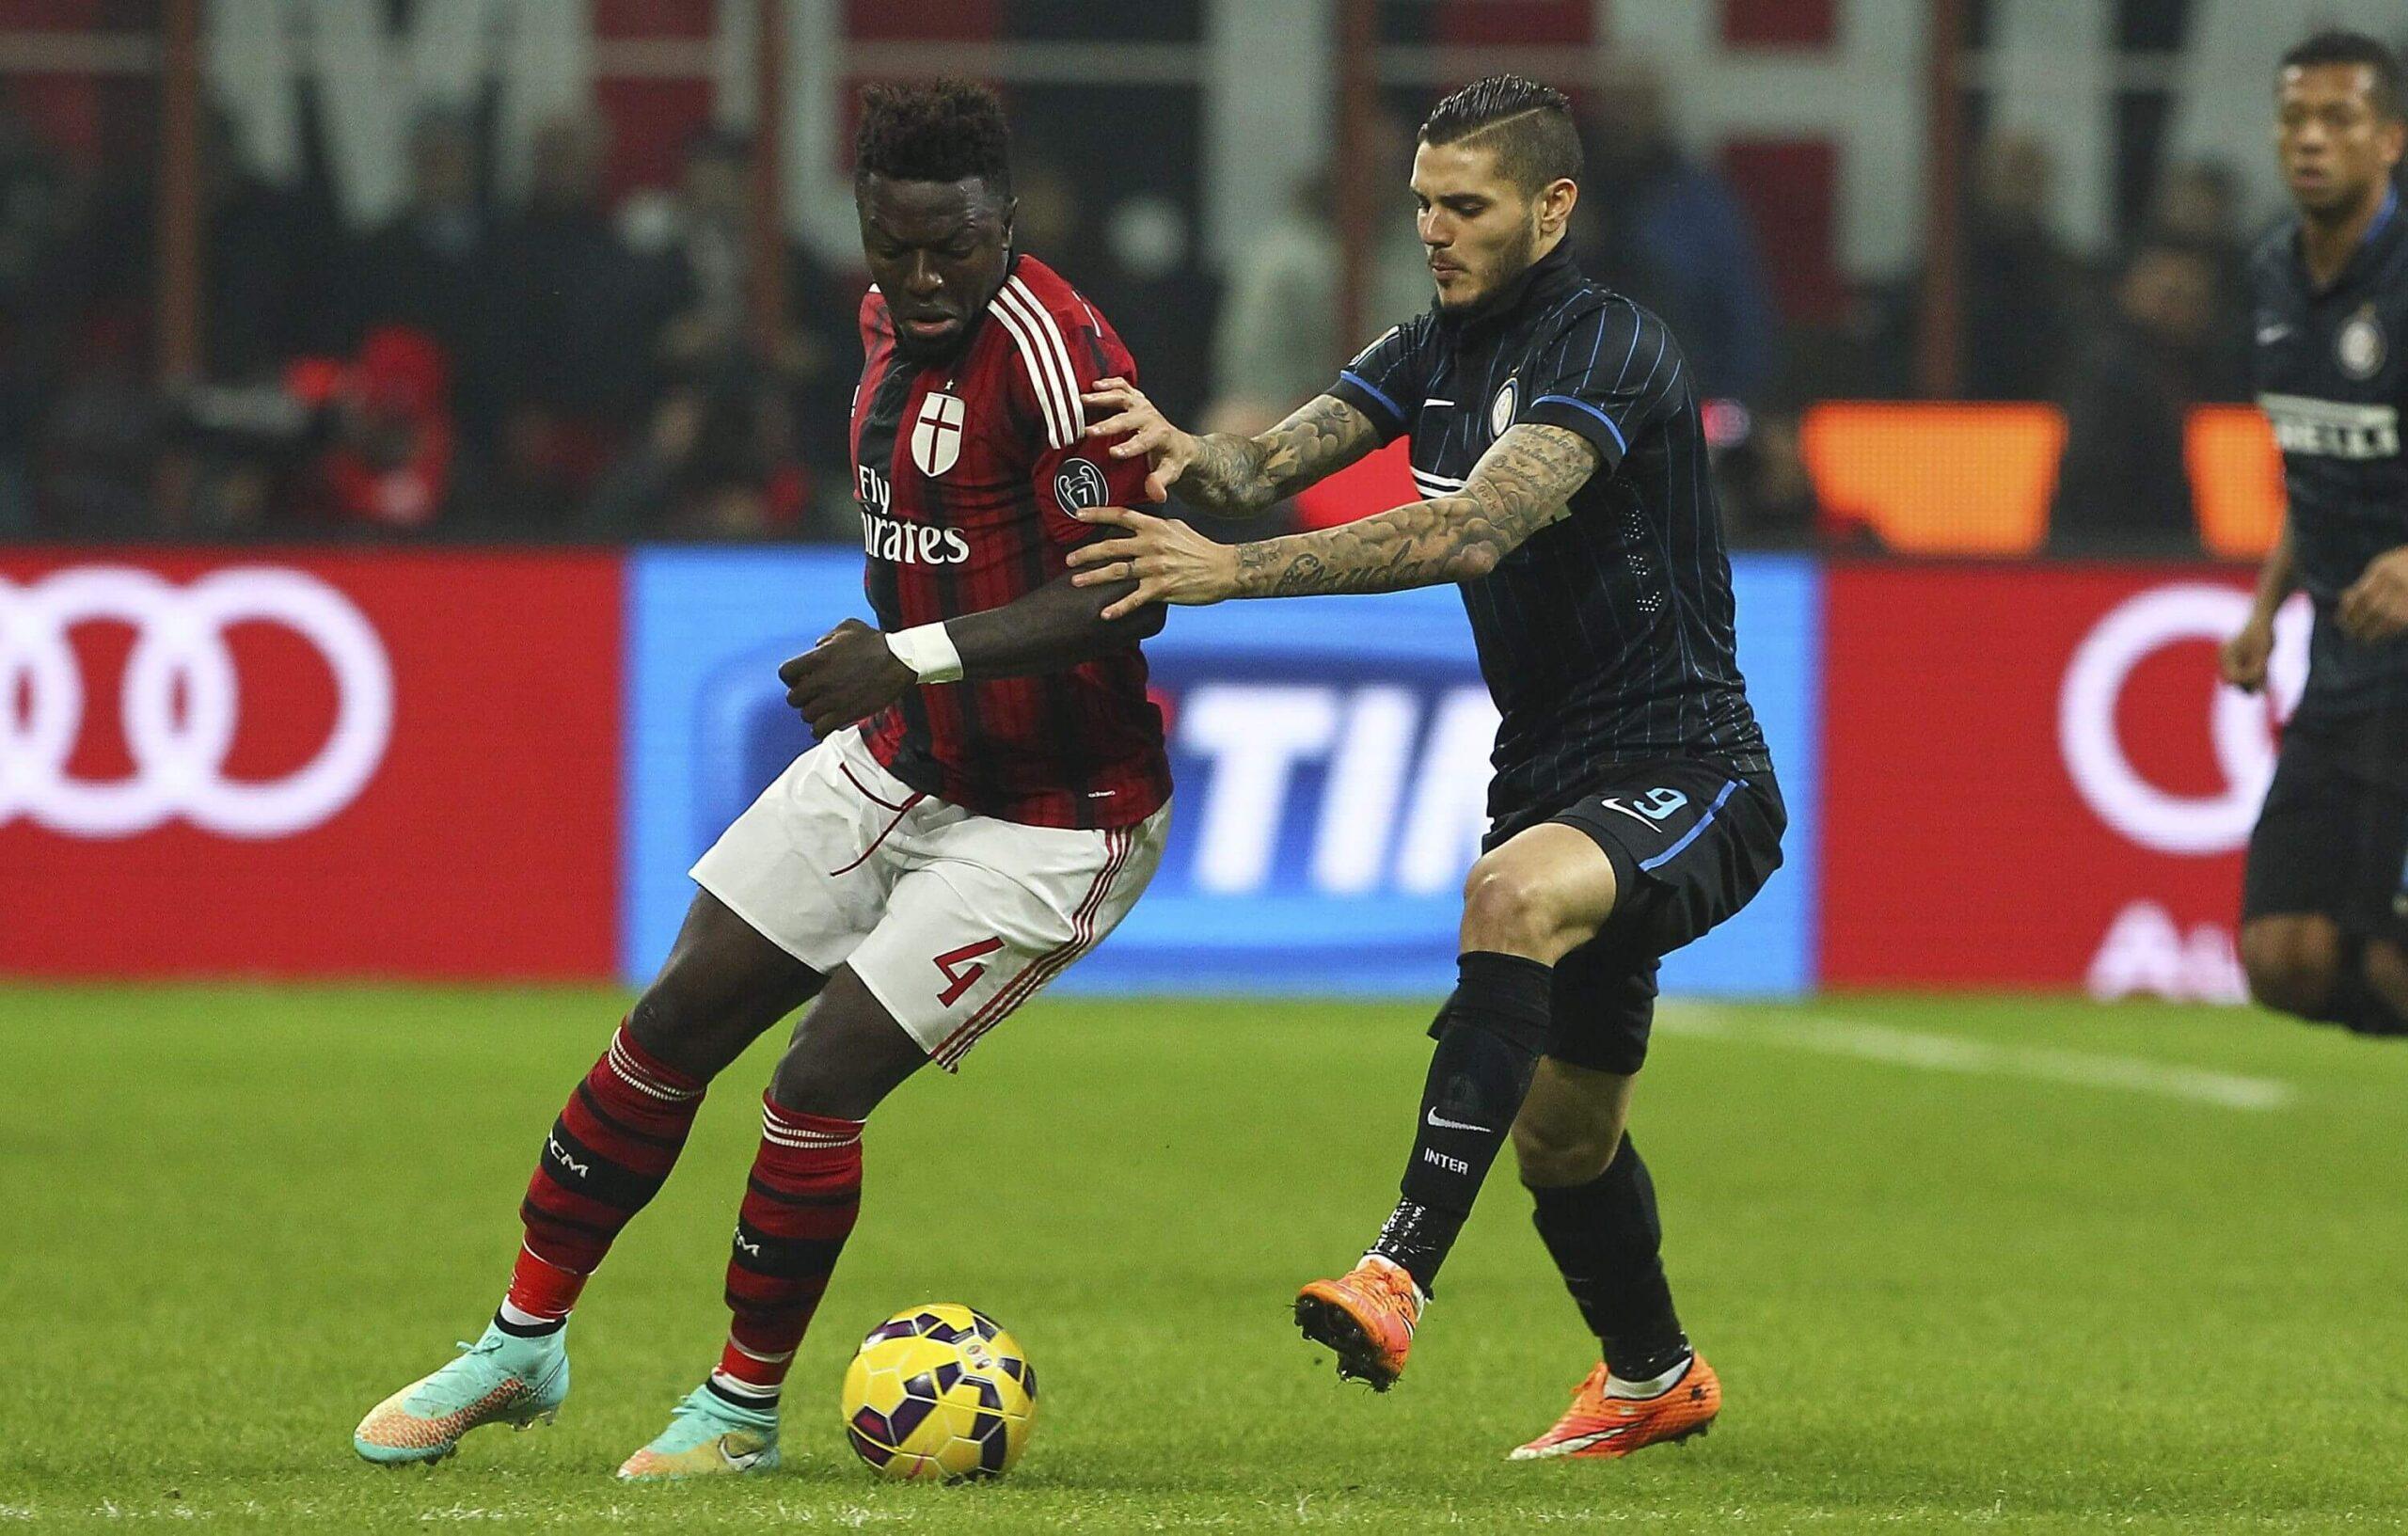 AC Milan Photo Gallery